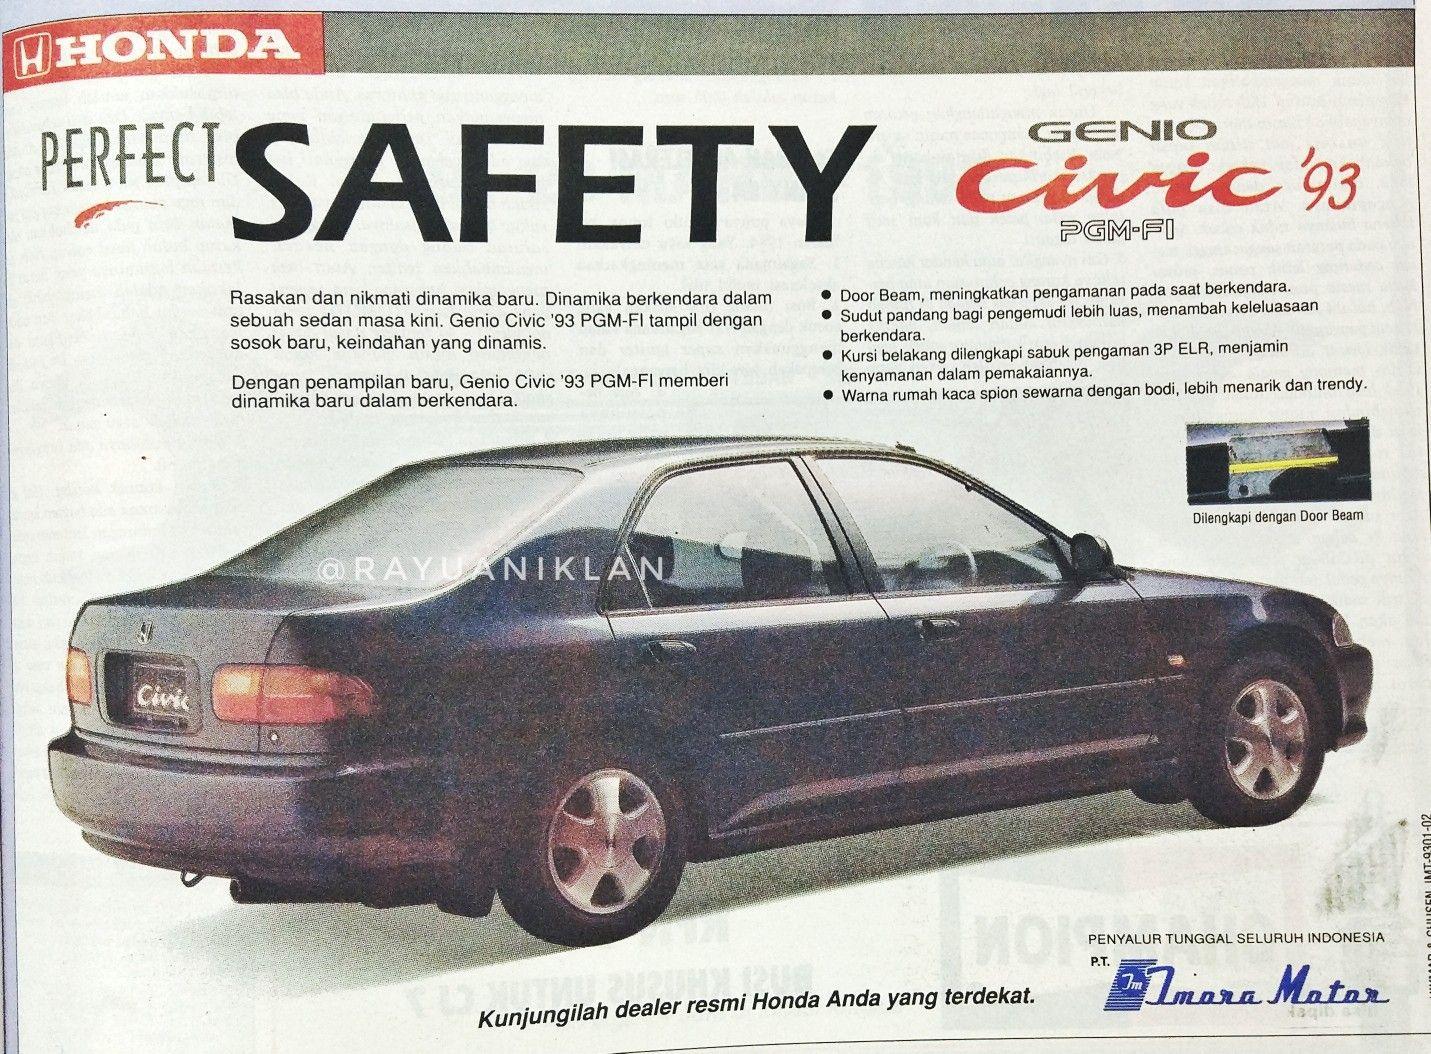 Pin By Darfi Rizkavirwan On Indonesian Print Ads Honda Civic